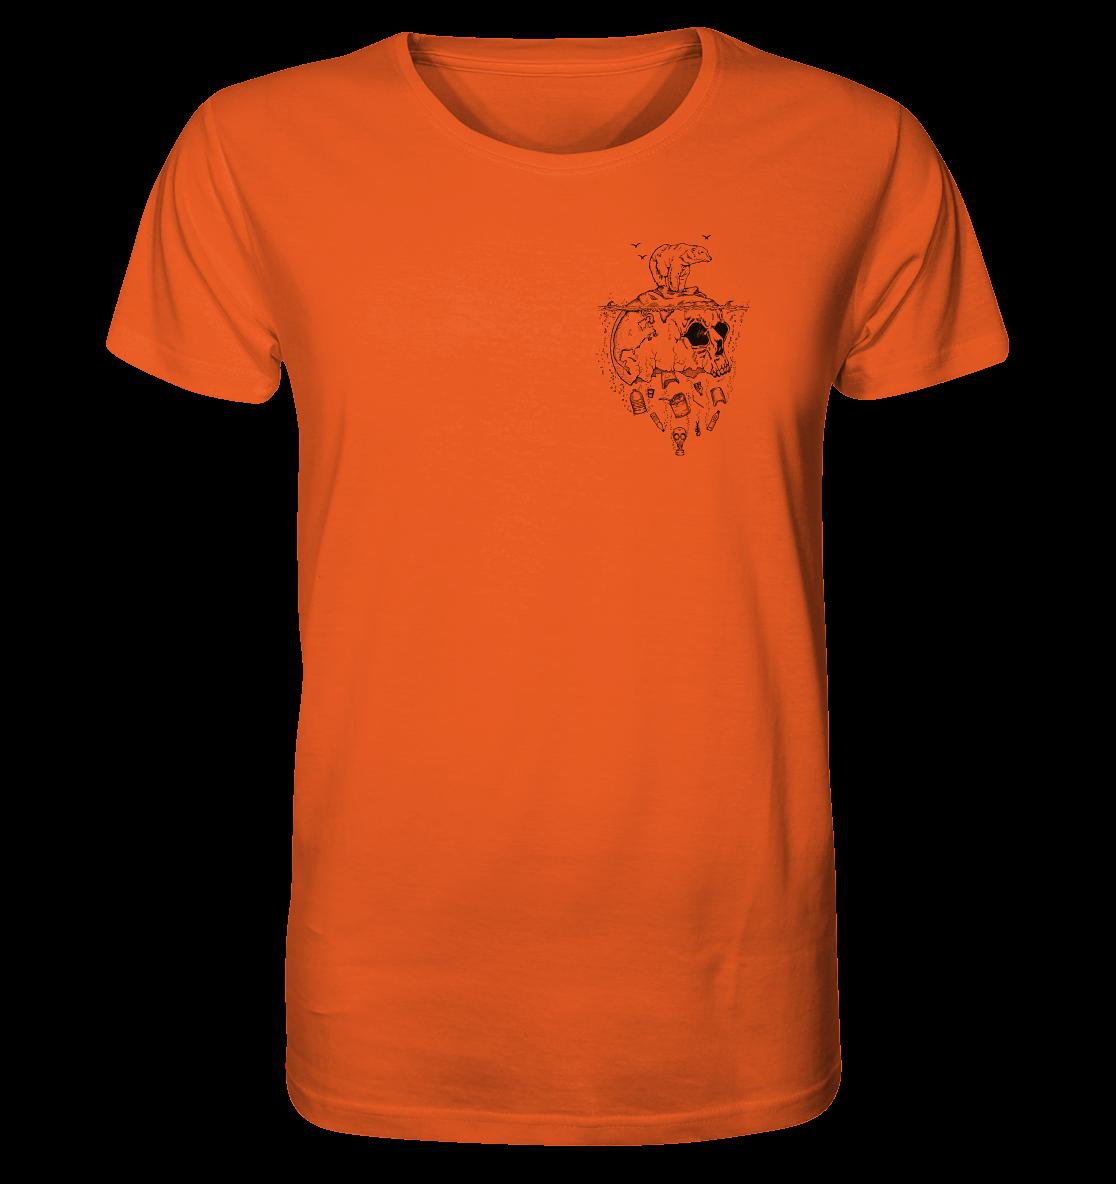 front-organic-shirt-ea5b23-1116x-36.png